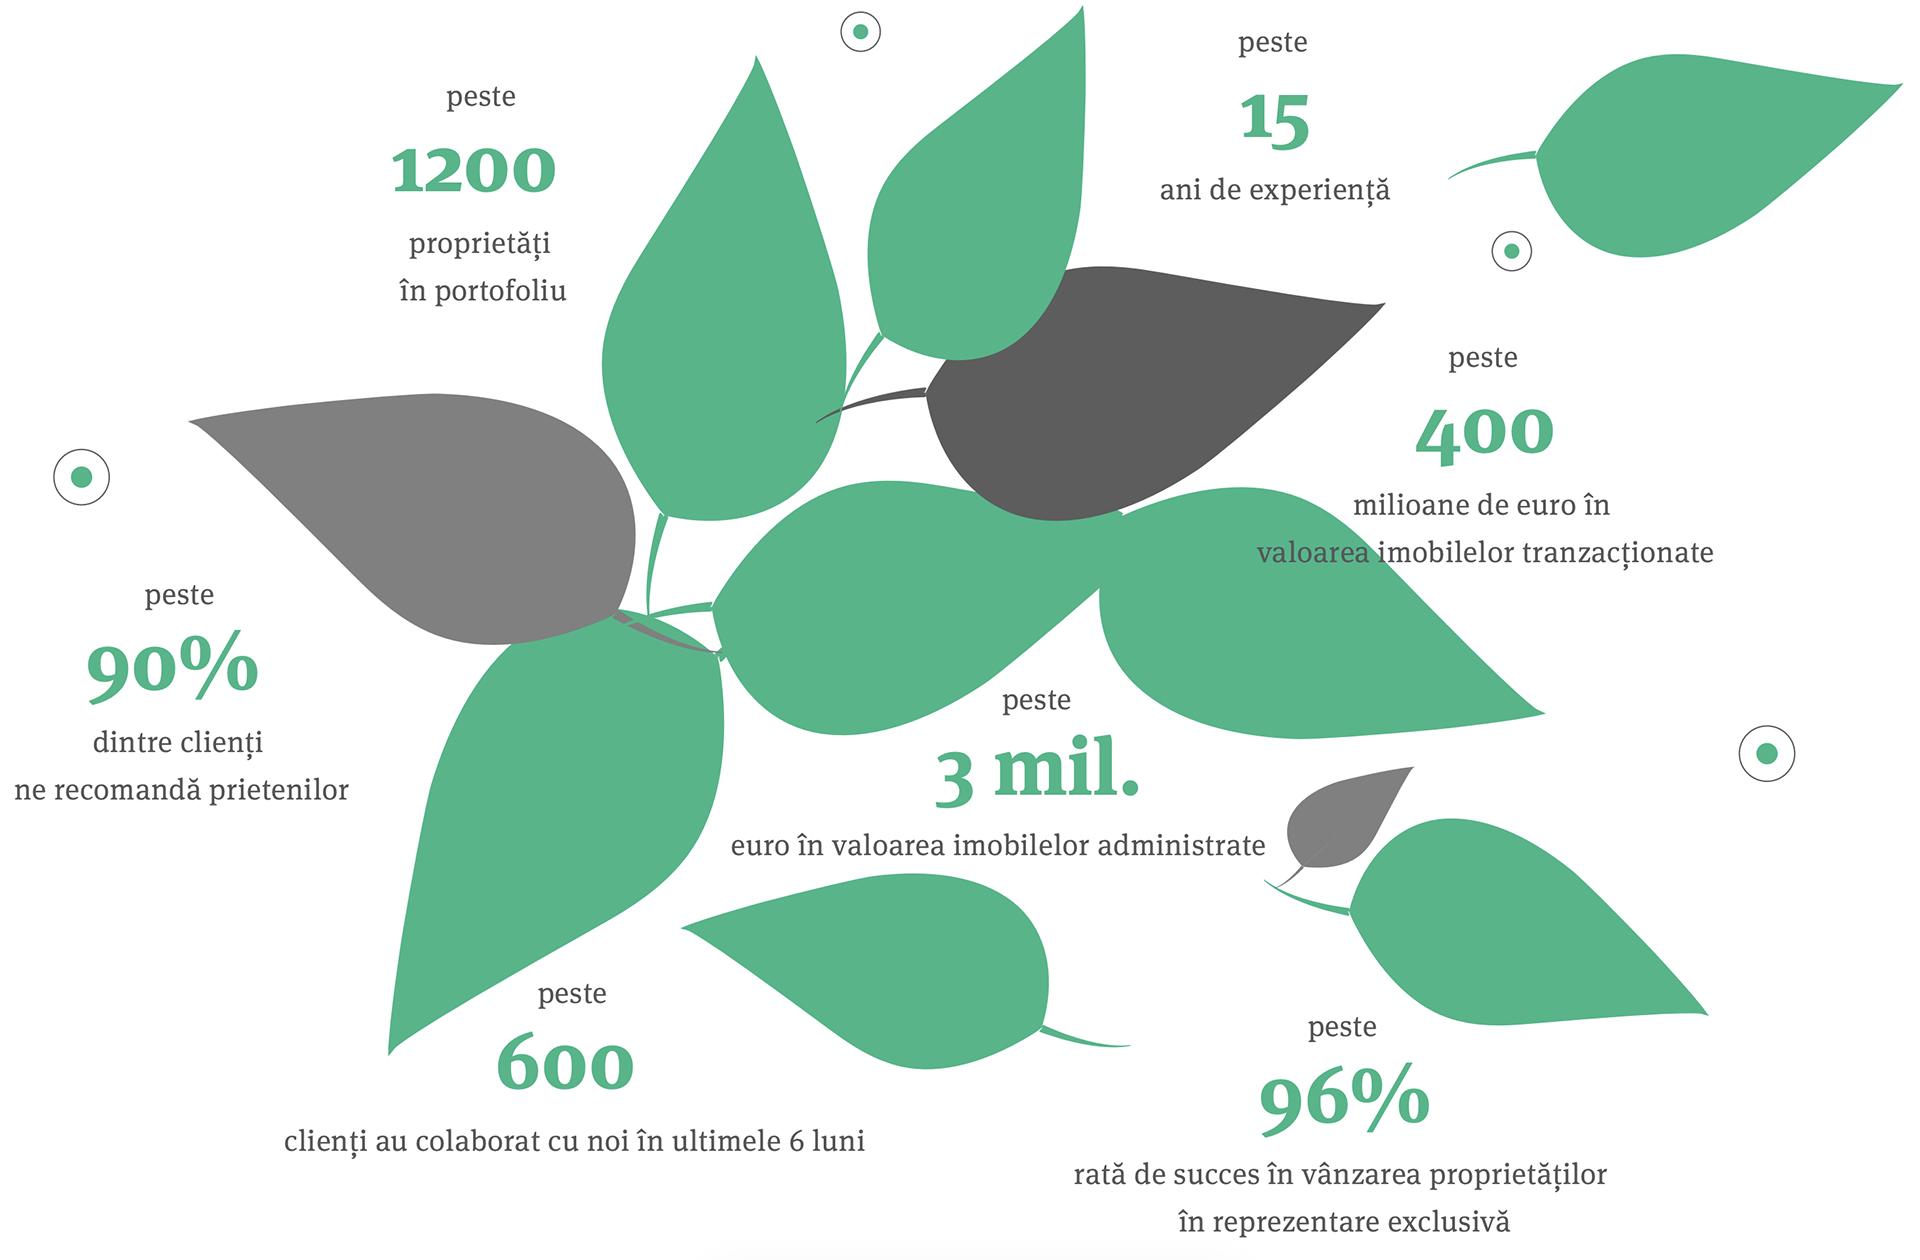 Green Alley Statistics